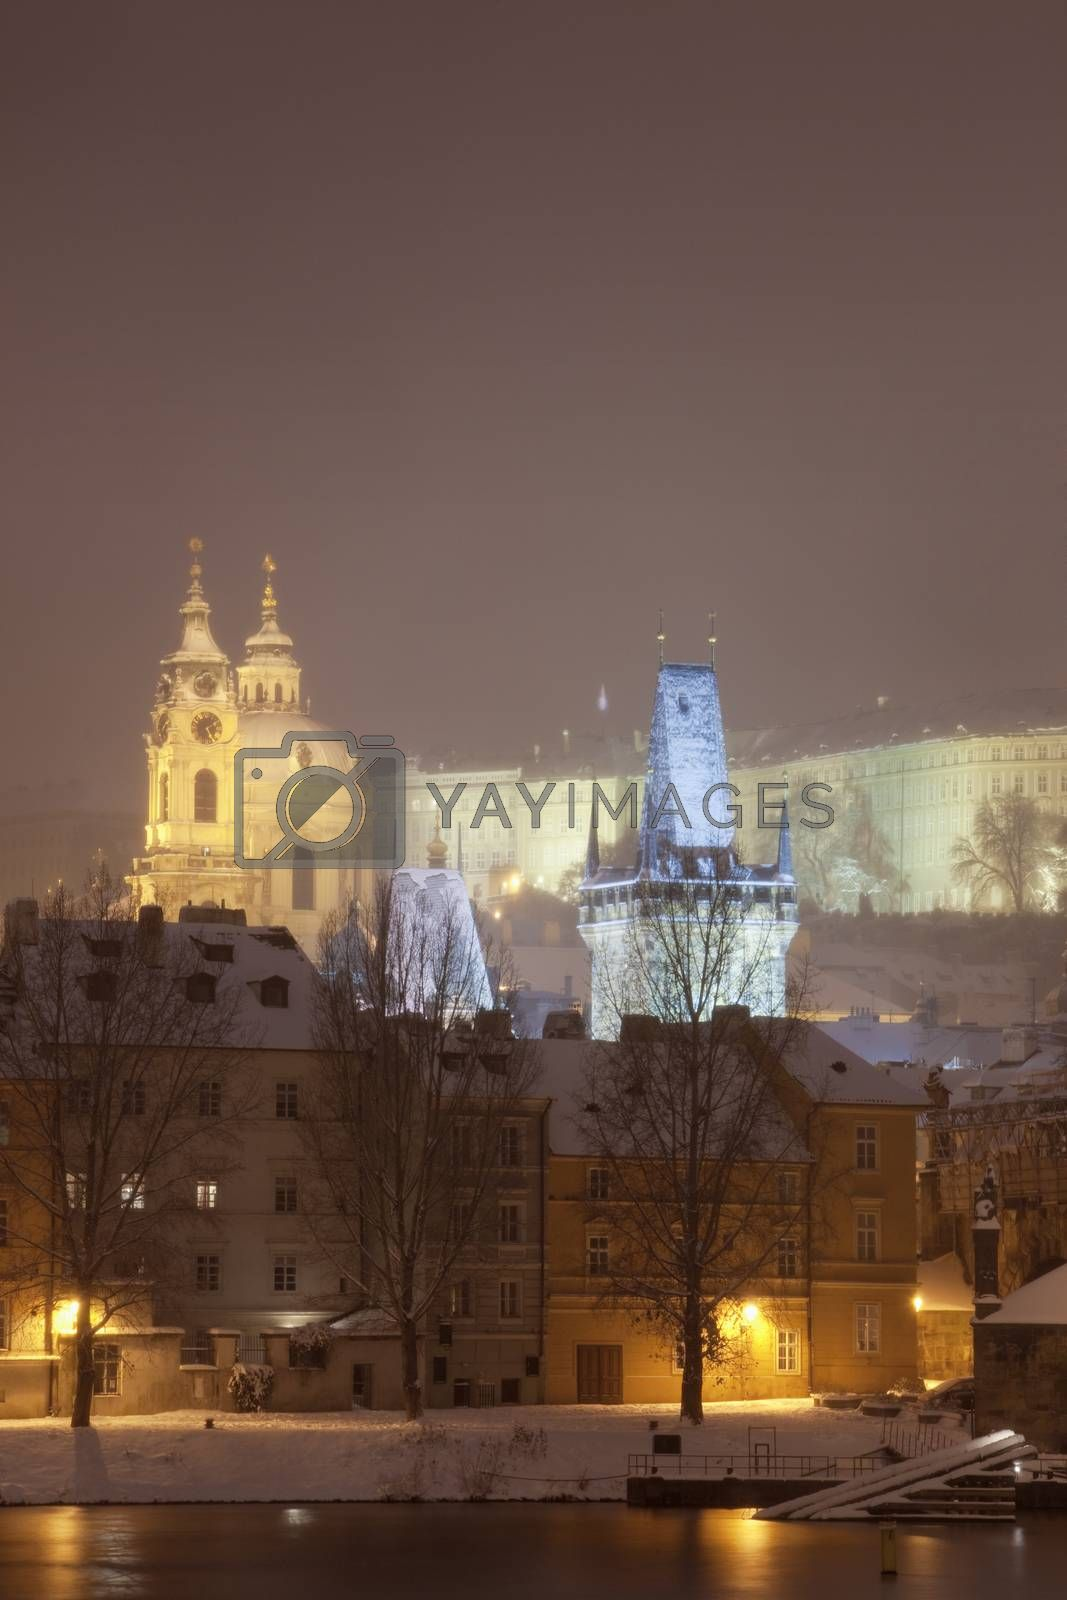 Royalty free image of prague in winter by courtyardpix